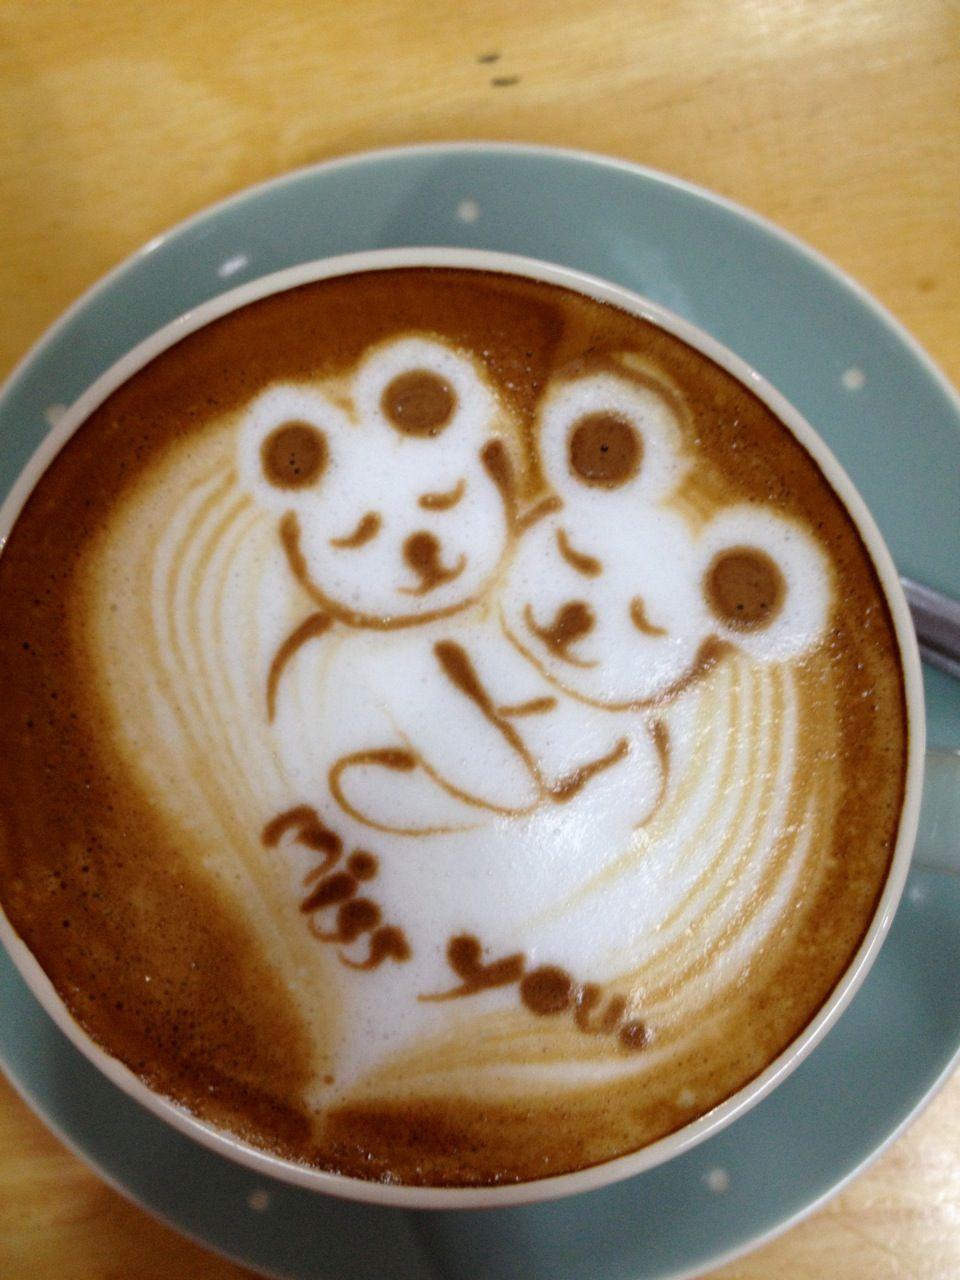 Mice Friends Miss You Fun With Coffee Coffee Love I Miss U